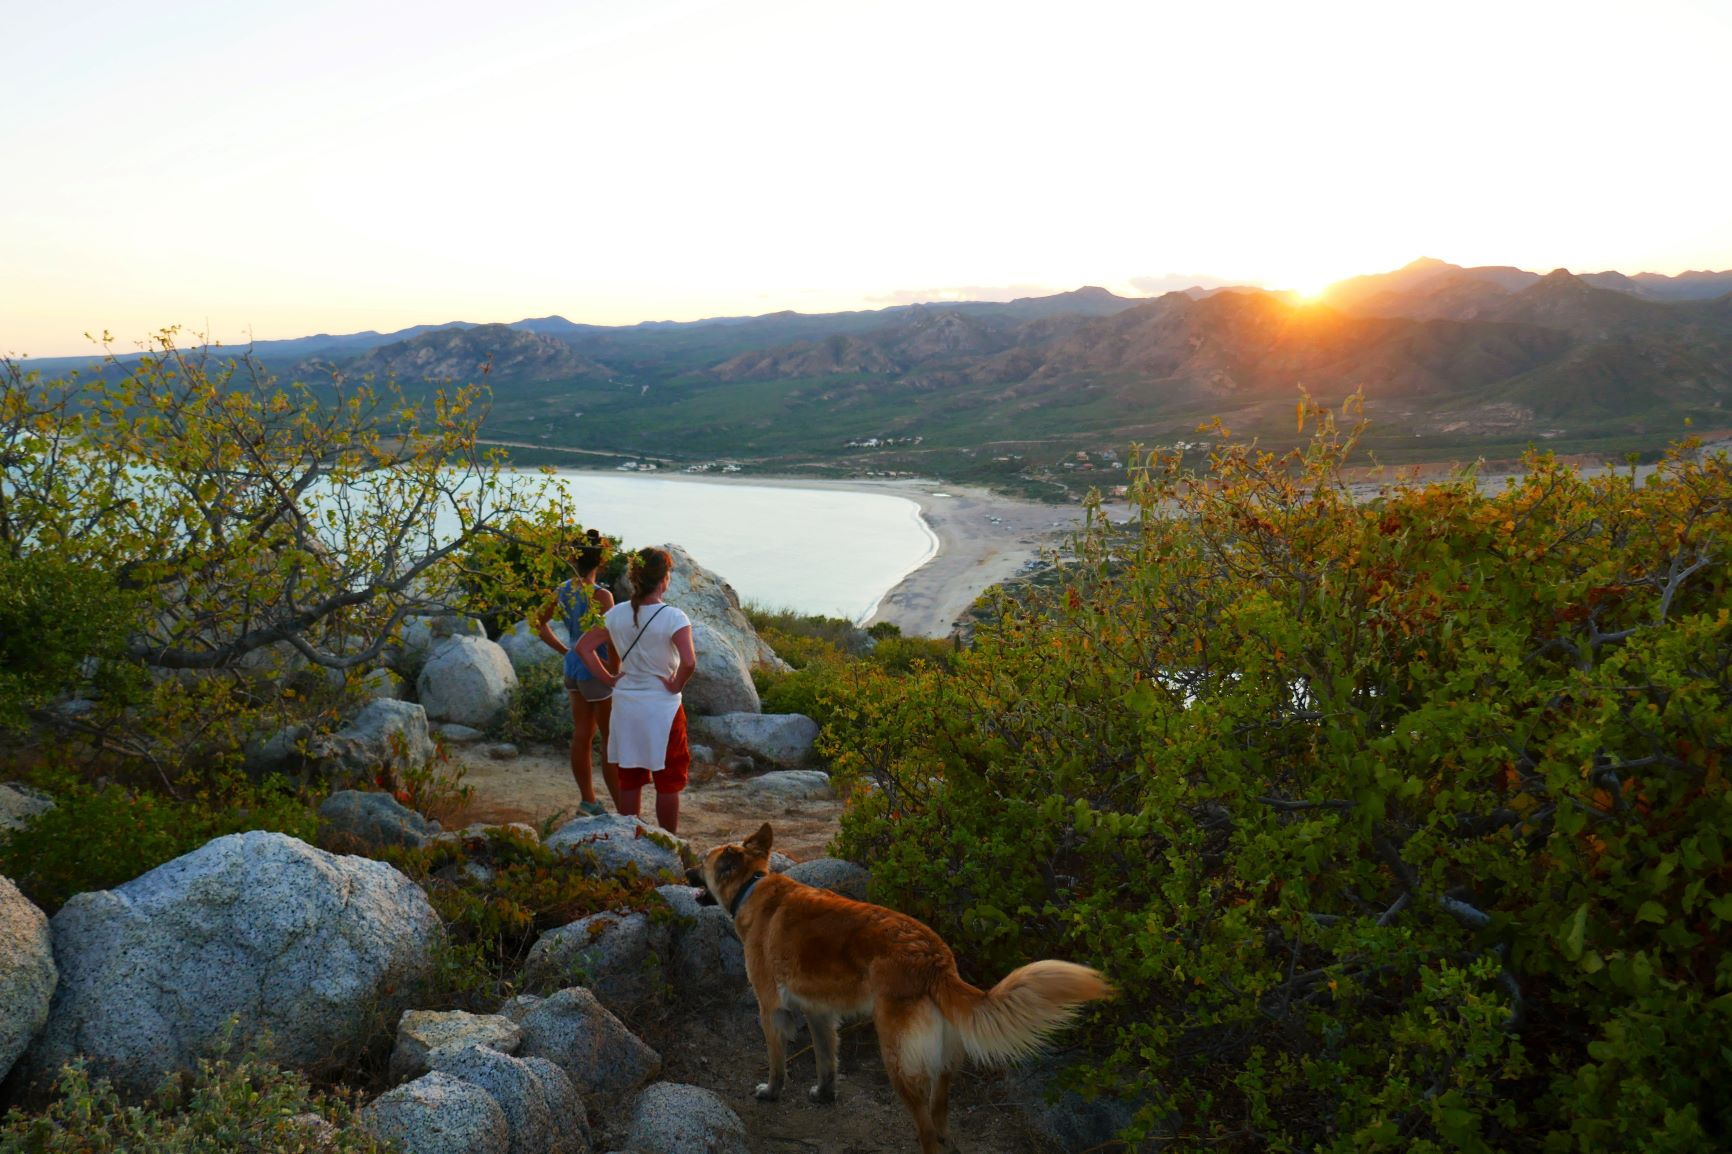 Sonnenuntergang über Los Frailles